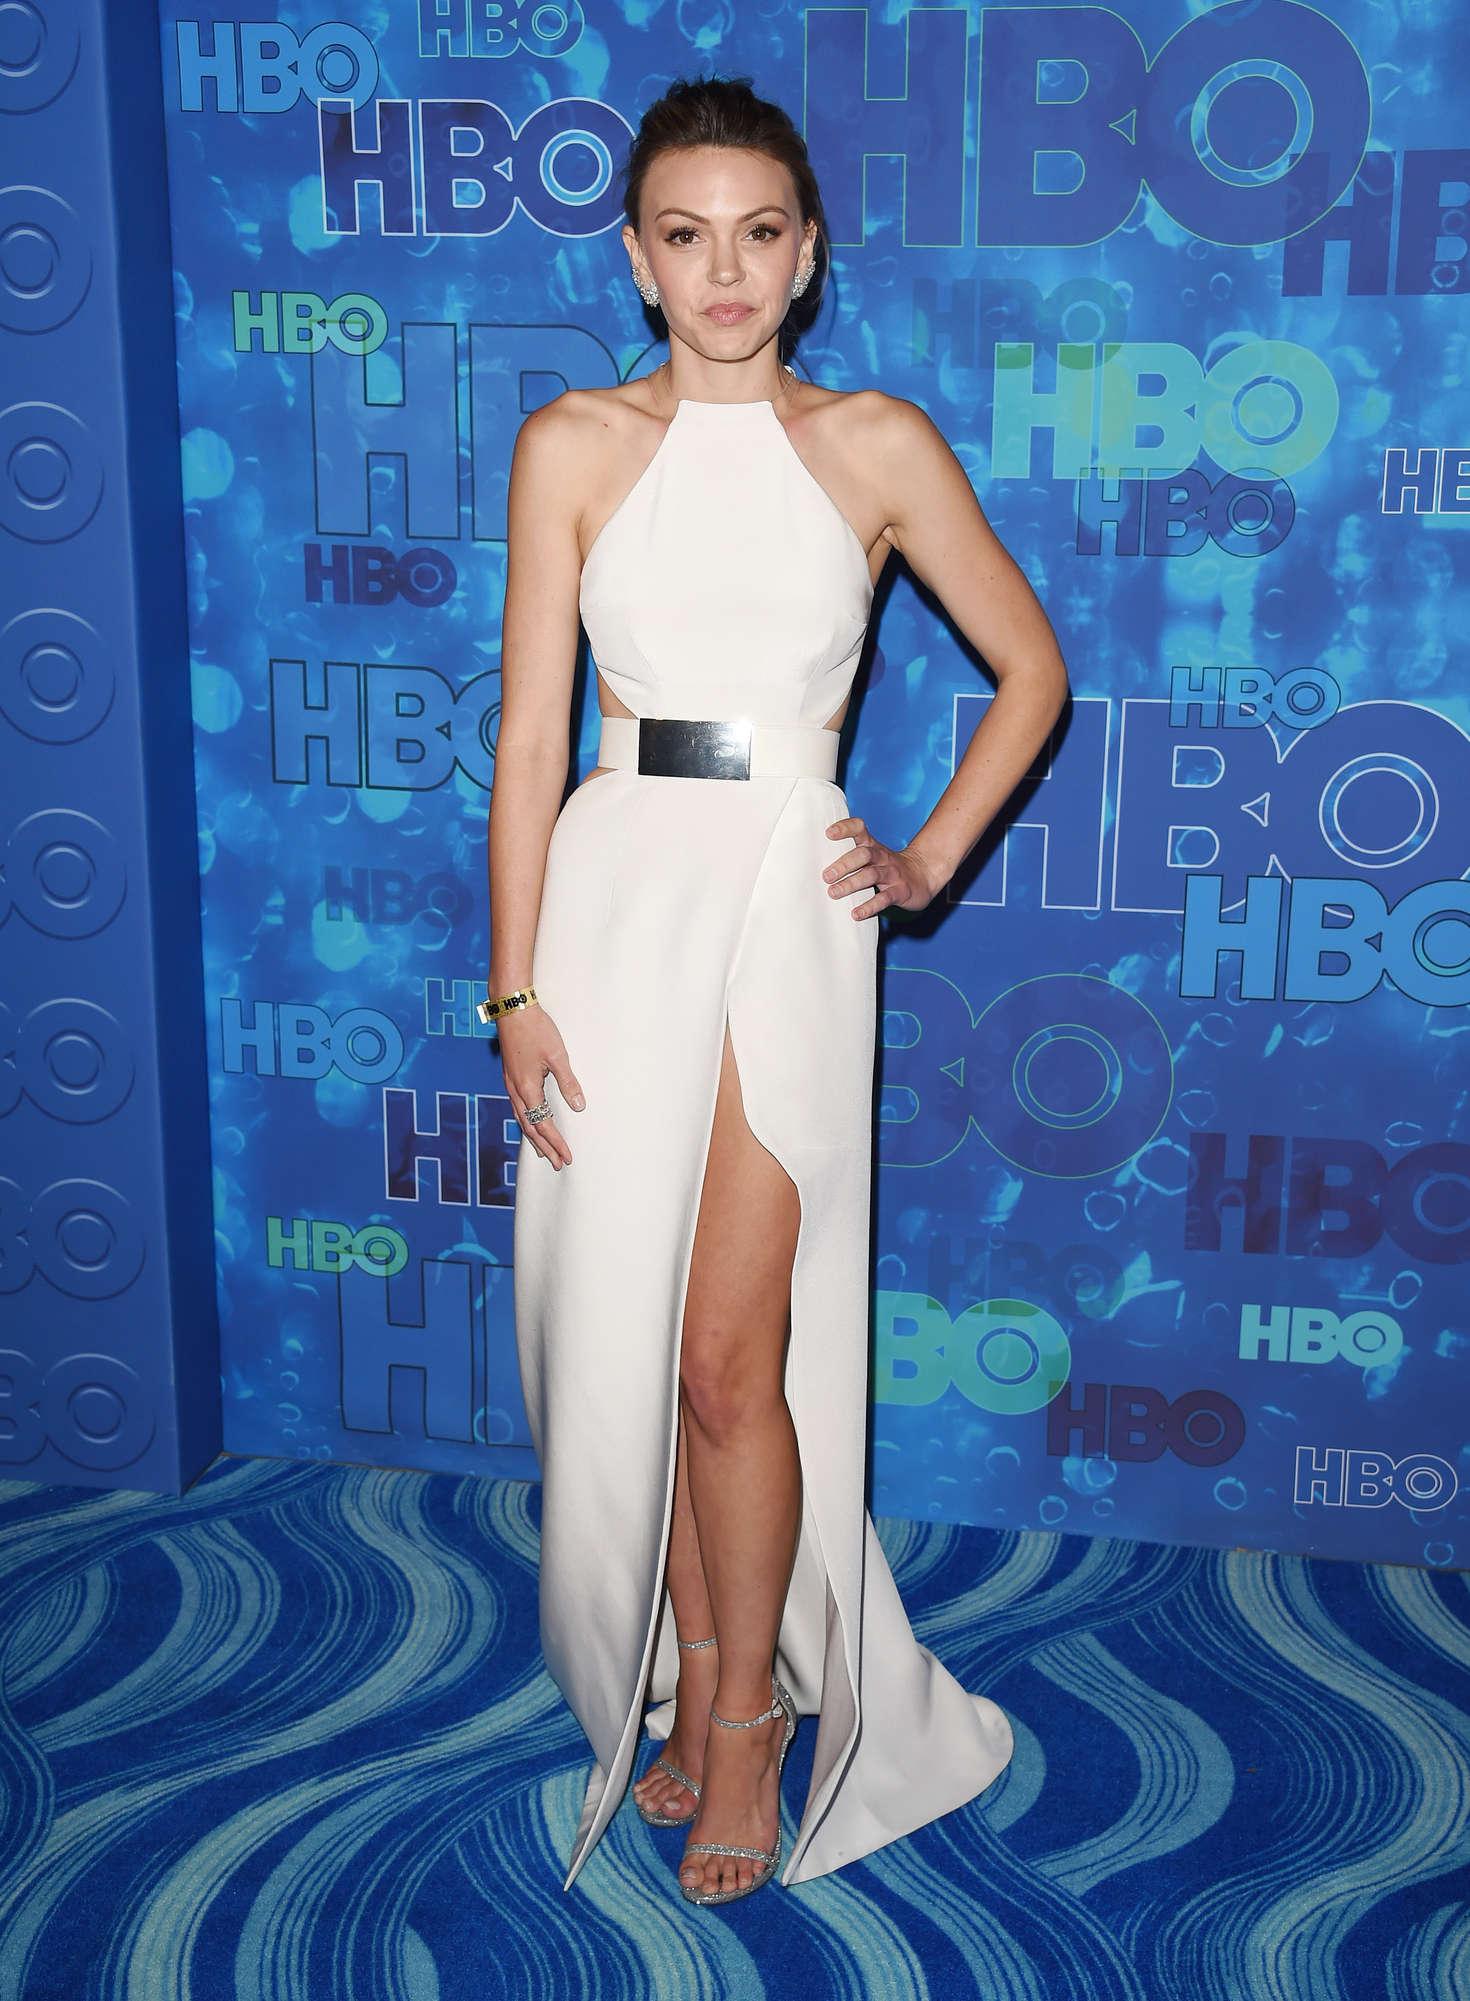 Aimee Teegarden - HBO's Post Emmy Awards Reception 2016 in LA